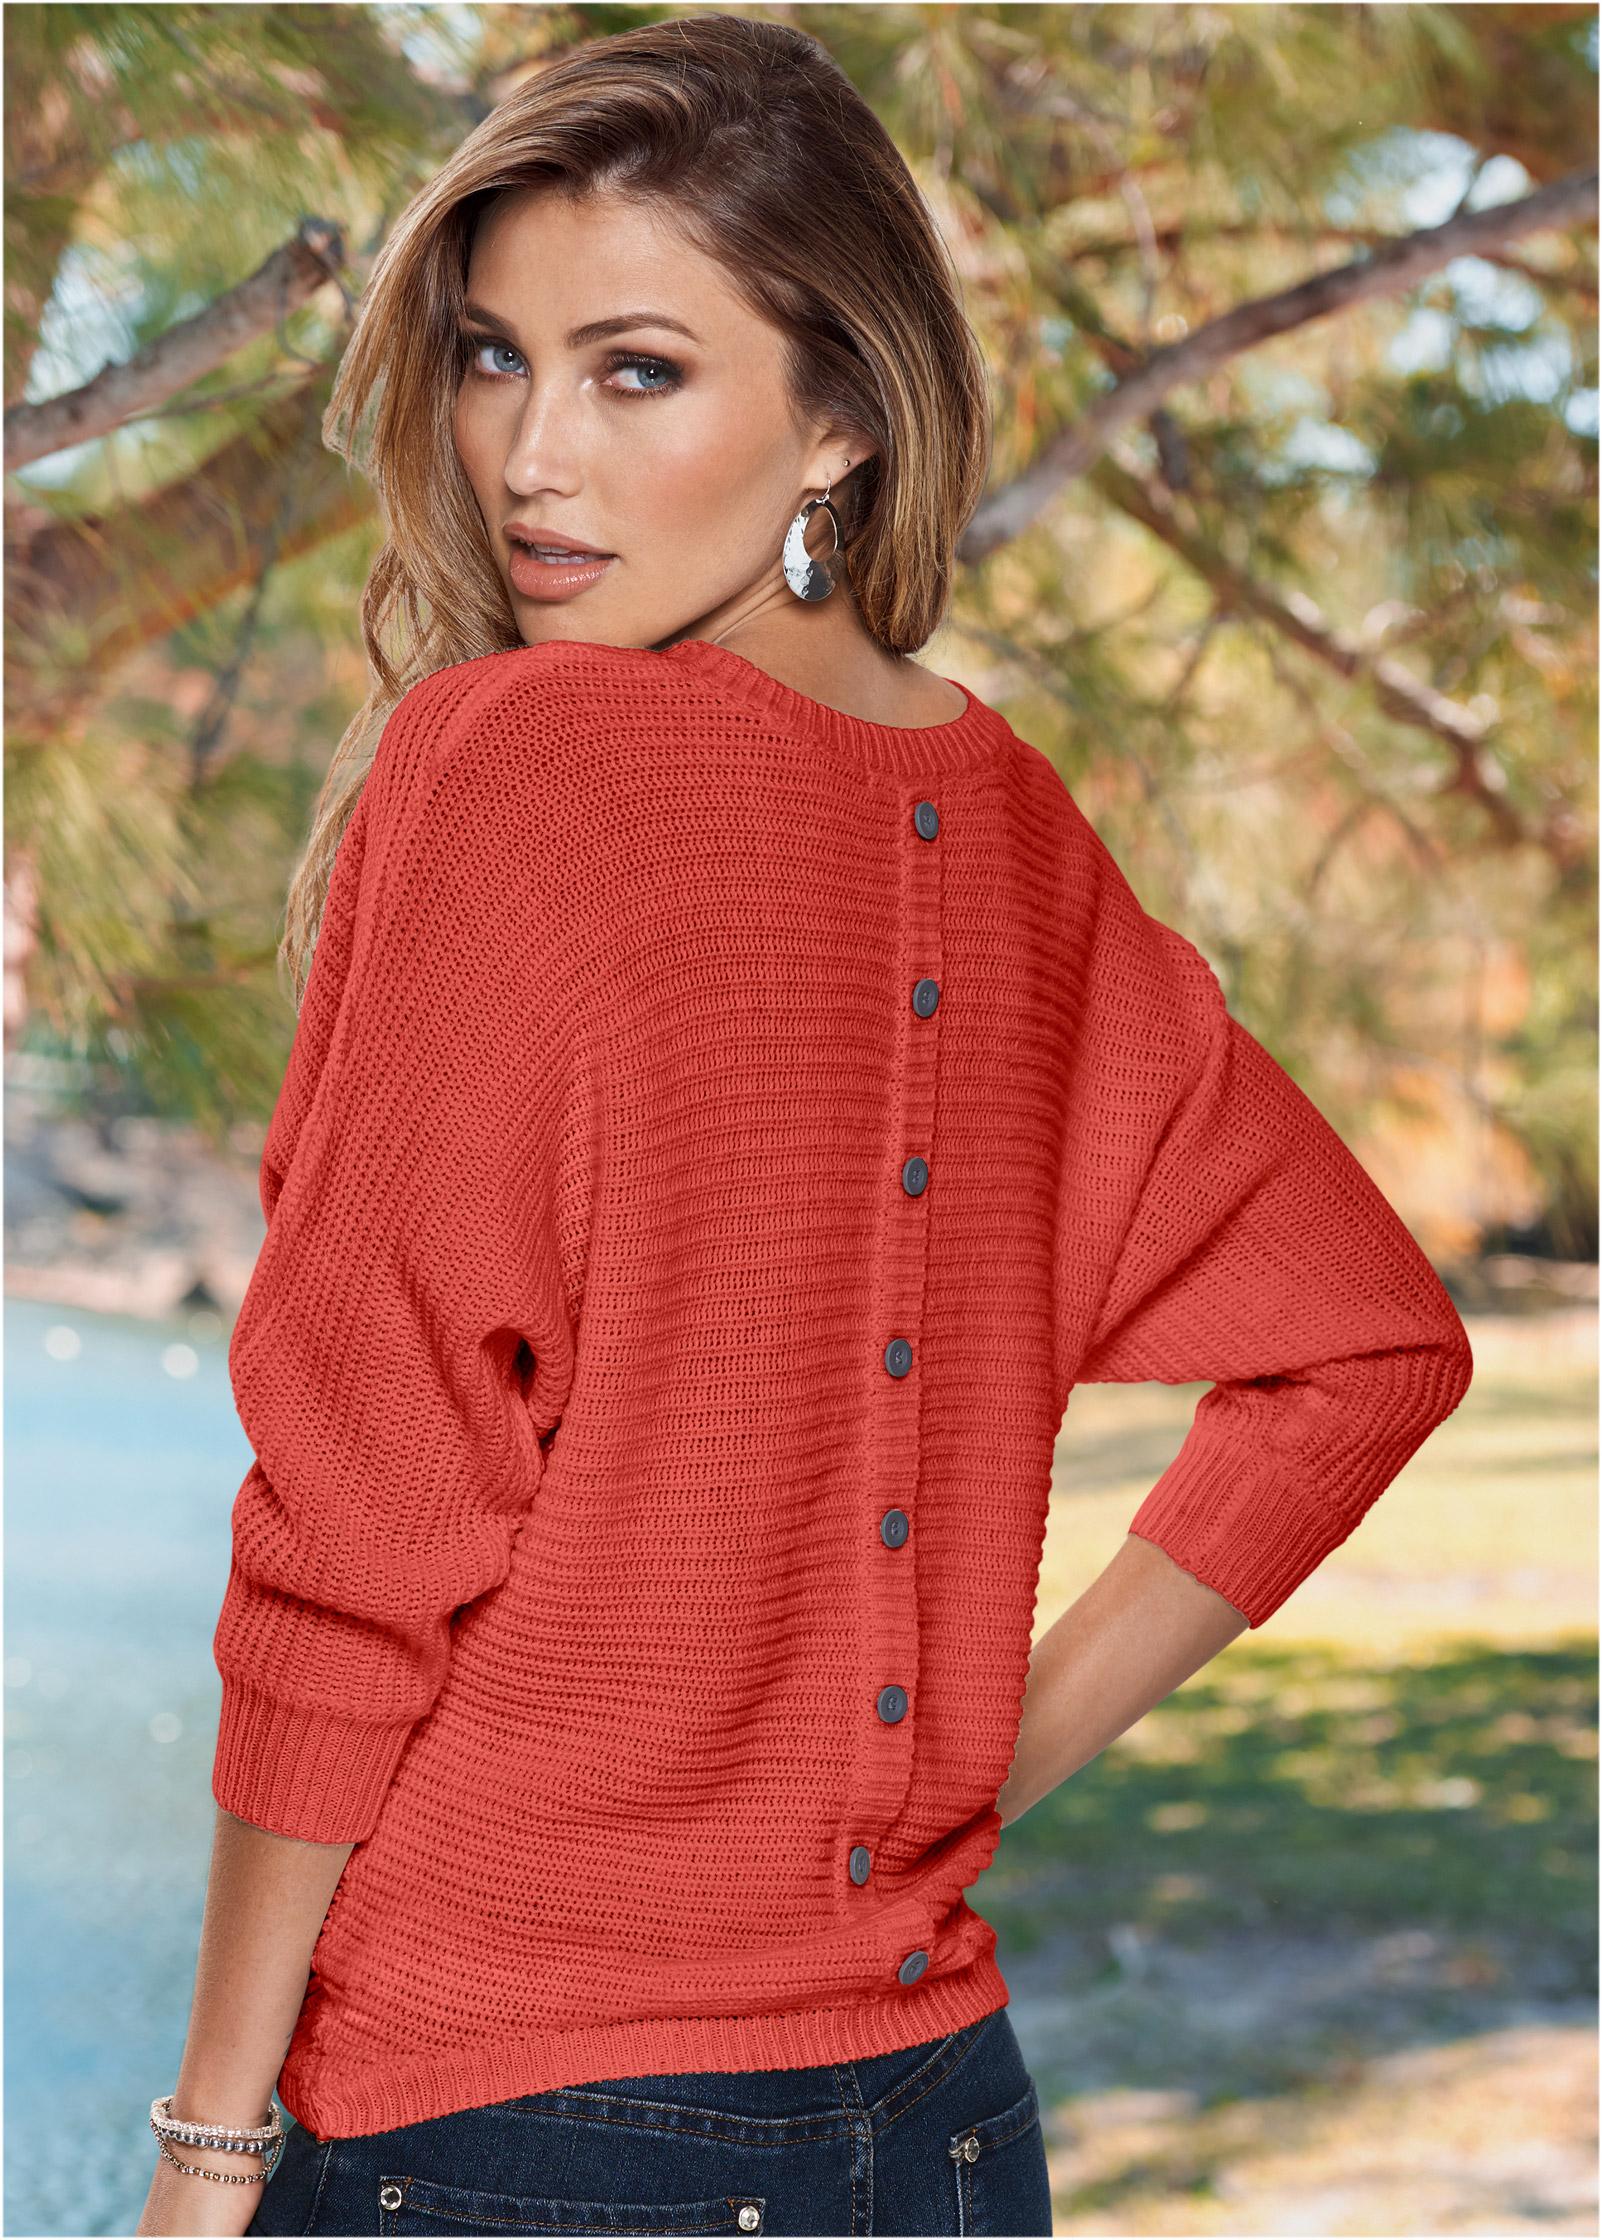 Erotic women sweaters